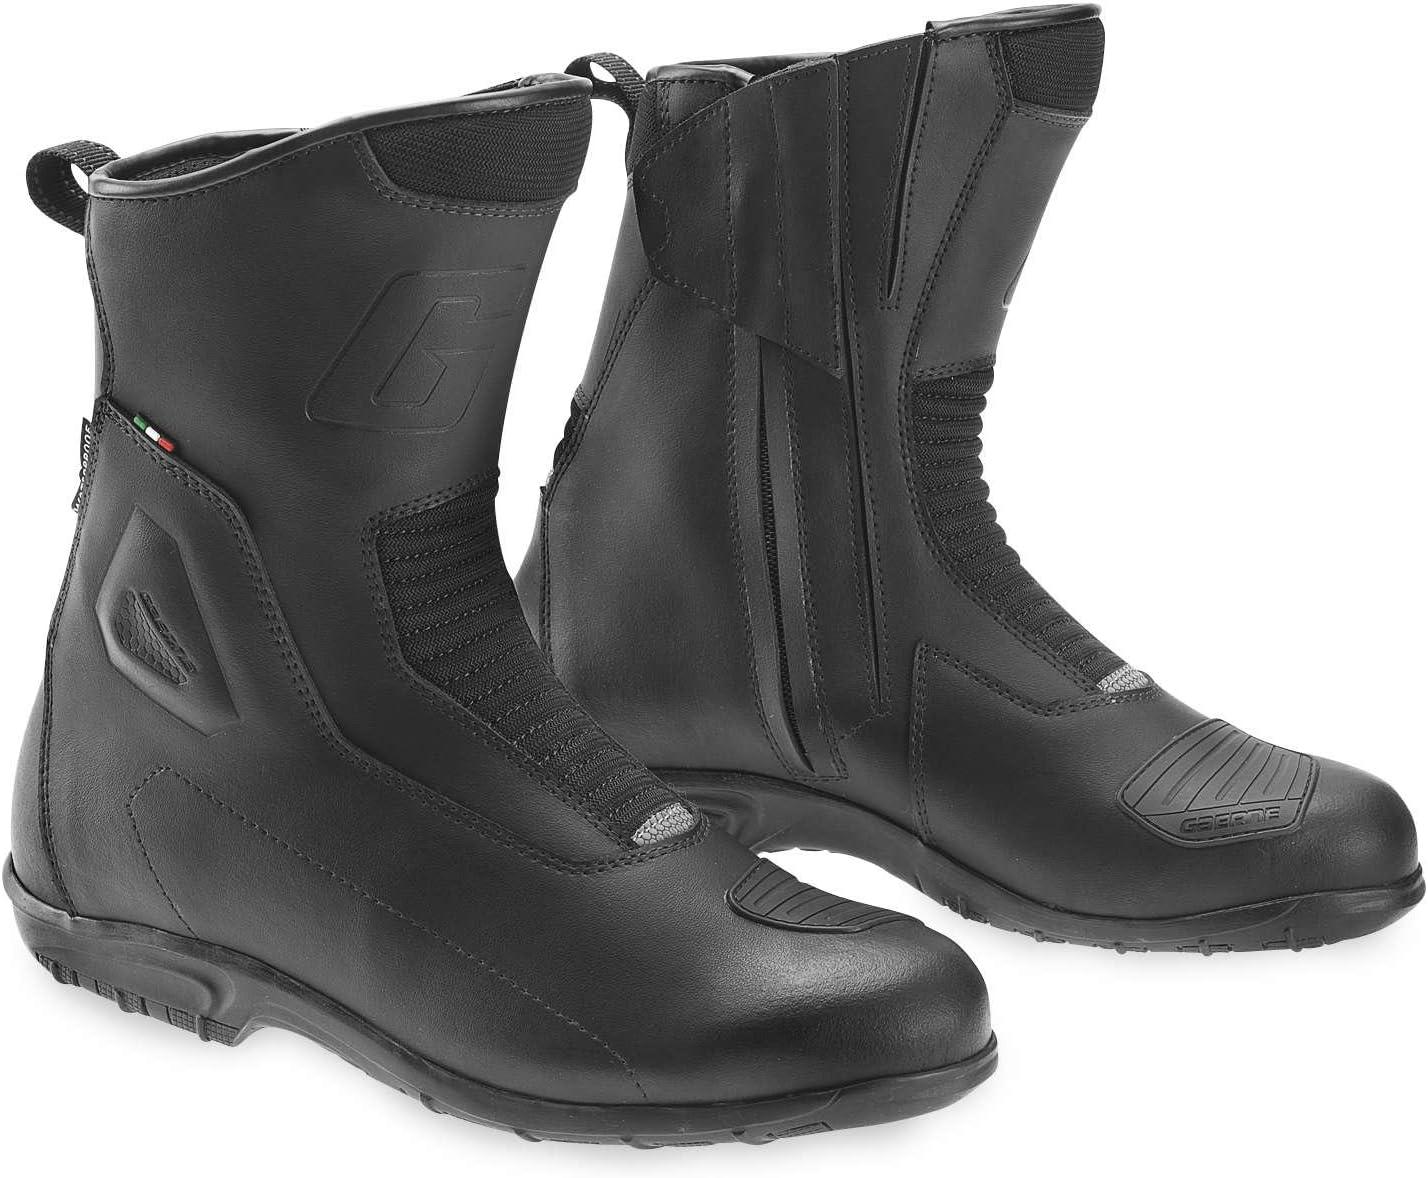 Distinct Name: Black Size: 12 Gaerne G-NY Boots Gender: Mens//Unisex Primary Color: Black